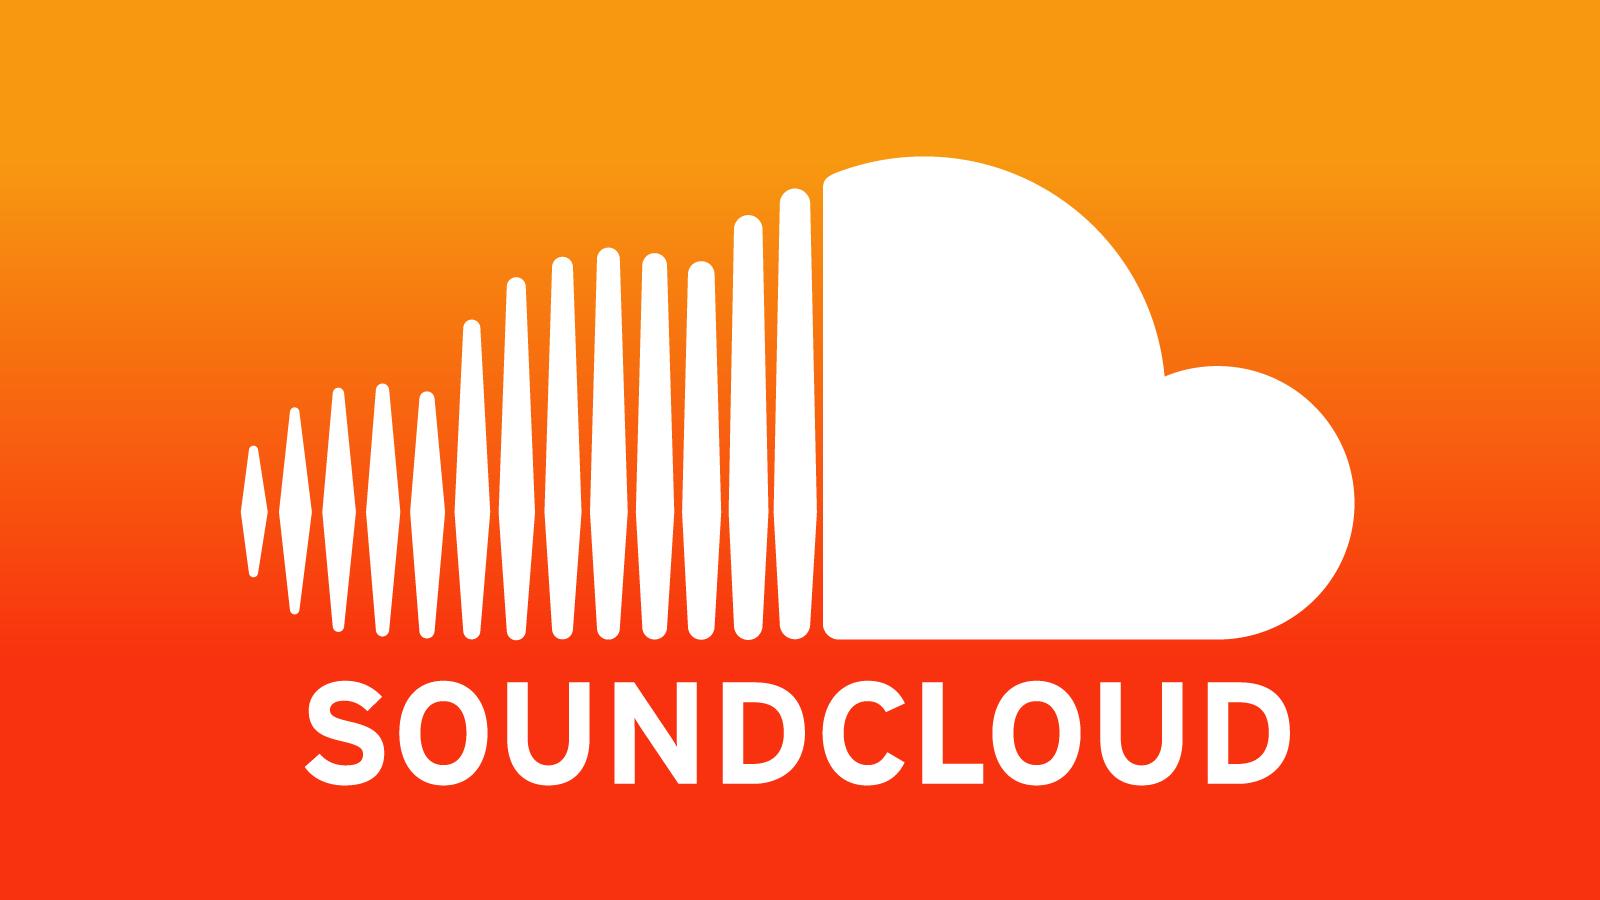 soundcloud logo computer wallpaper 66509